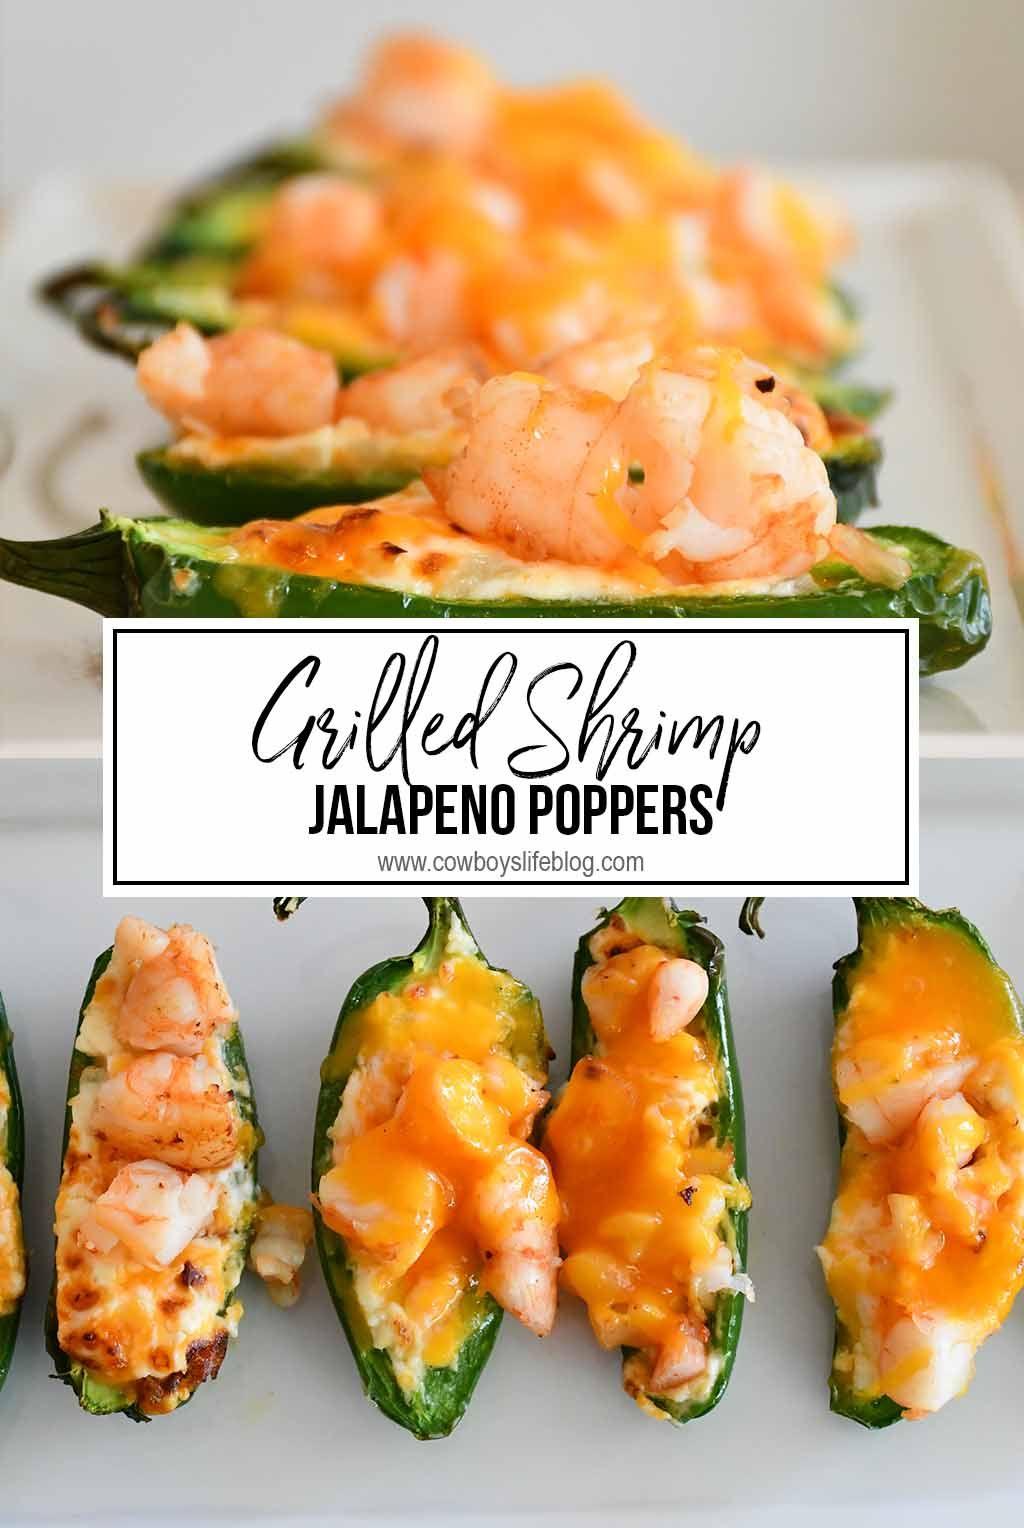 Grilled Shrimp Jalapeño Poppers - A Cowboys Life